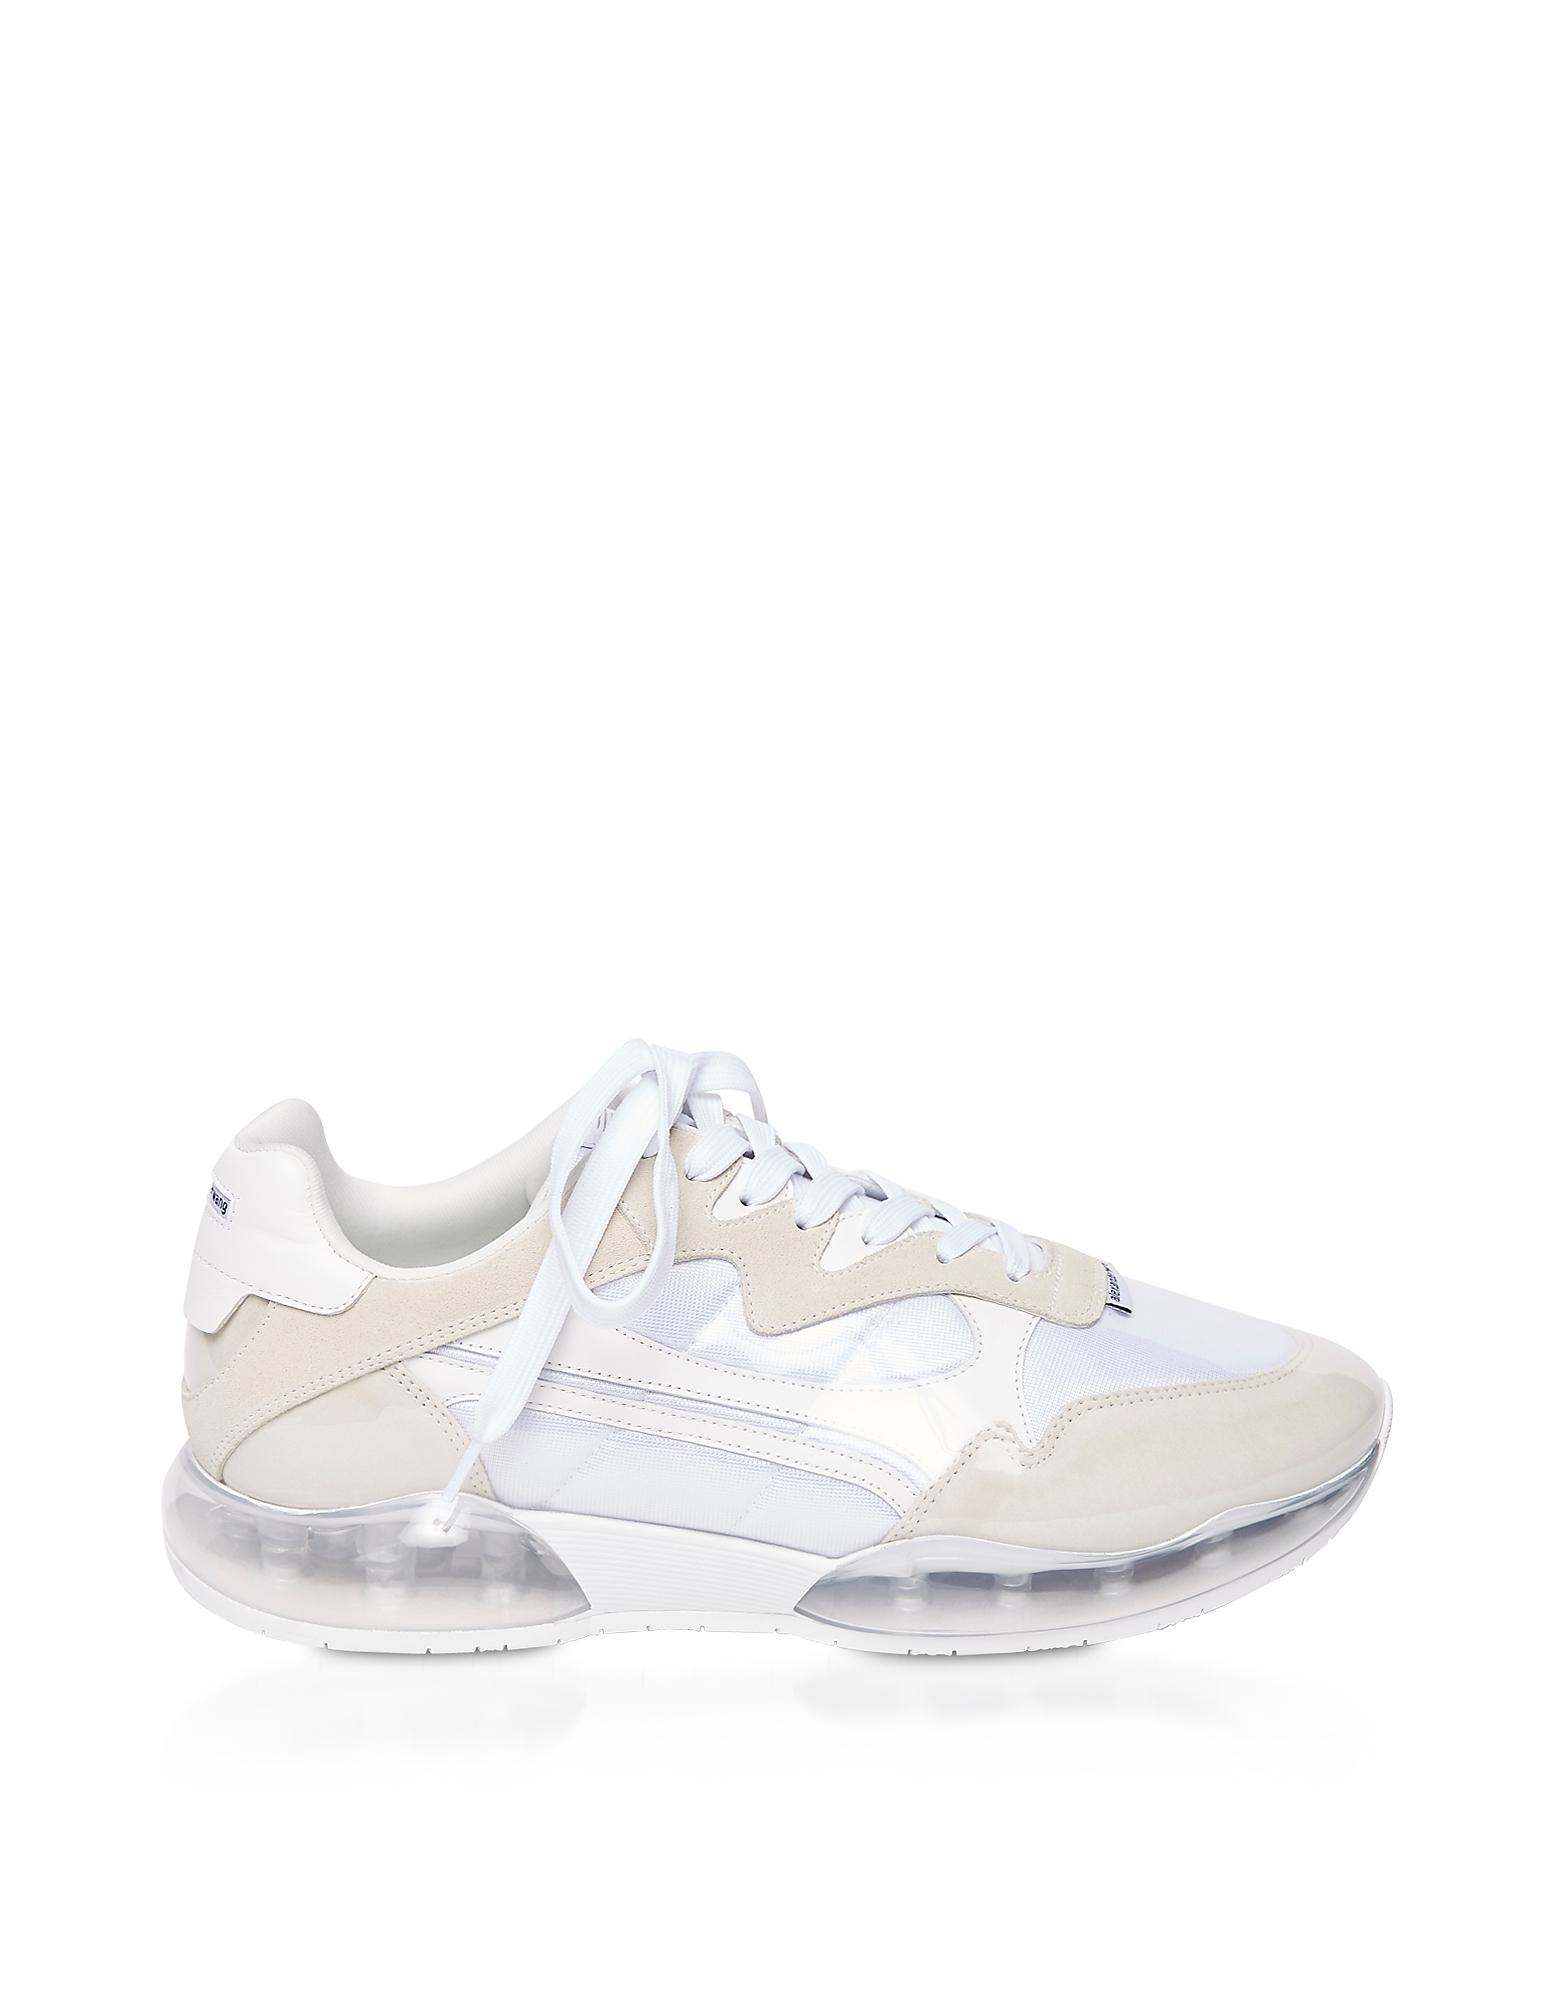 Alexander Wang Designer Shoes, White Suede & Mesh Stadium Sneakers